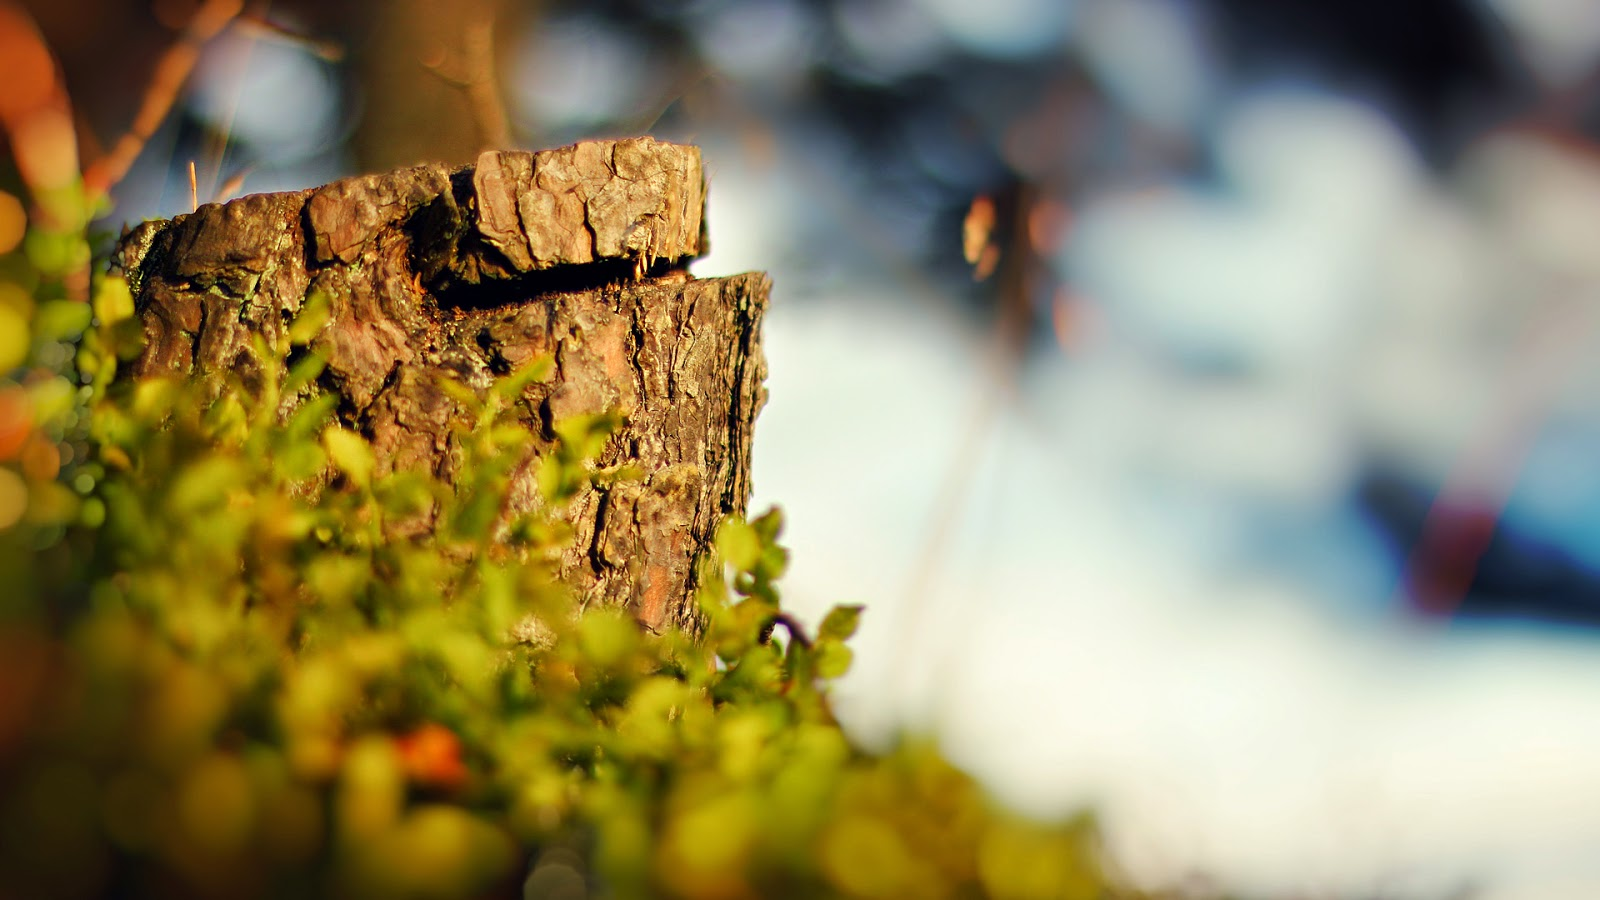 Nature wallpaper 1080p